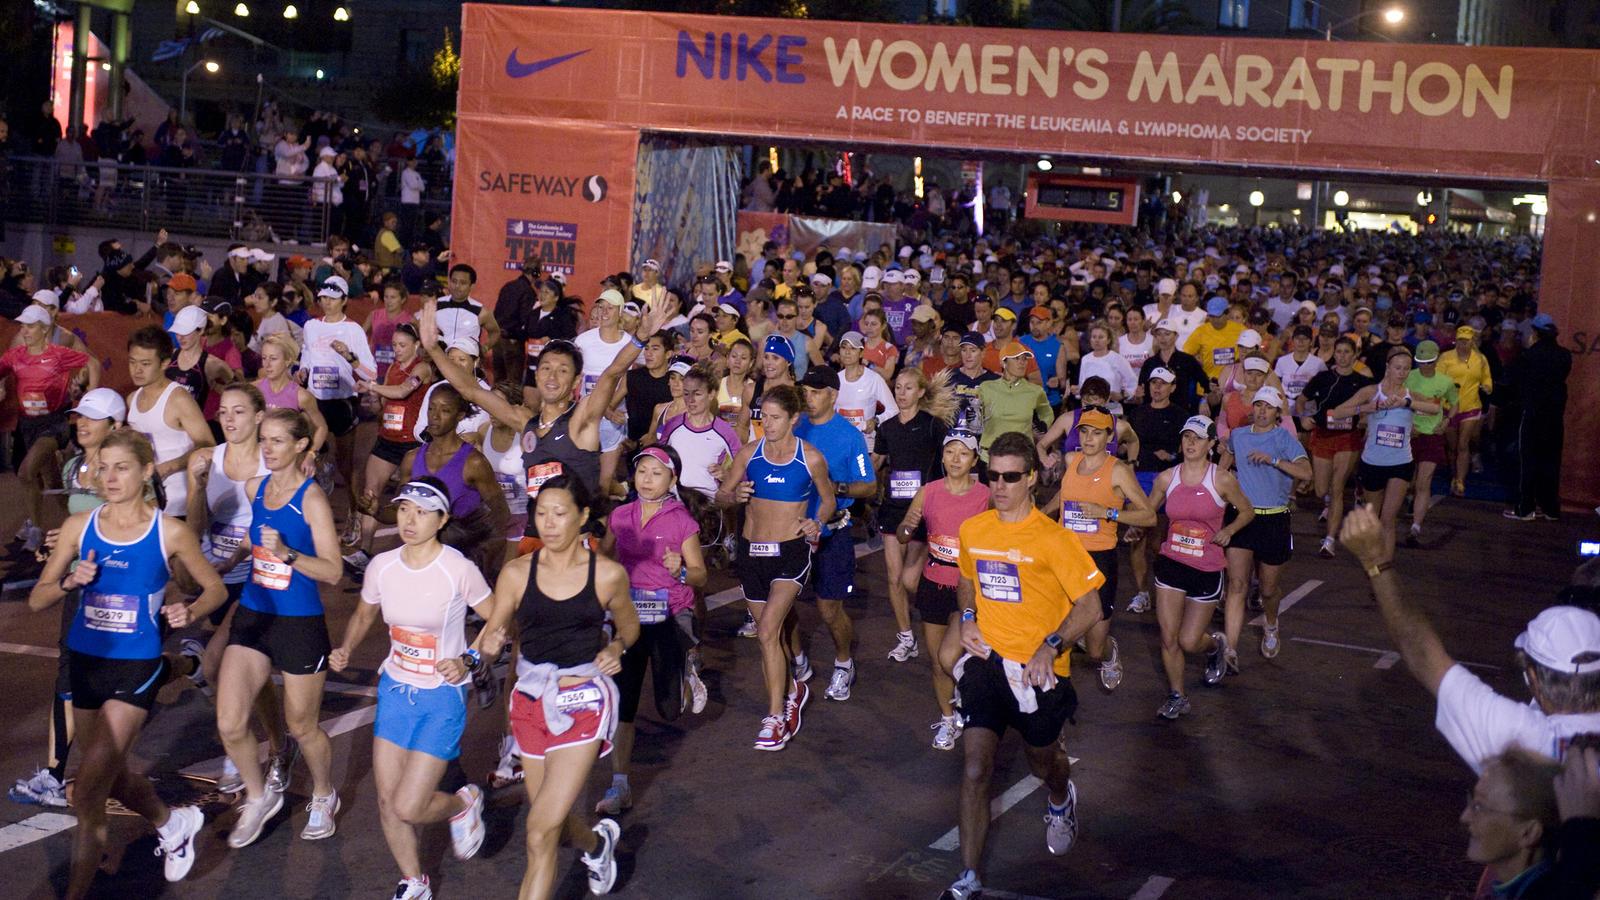 6728ed586 20,000 runners complete Nike Women's Marathon - Nike News